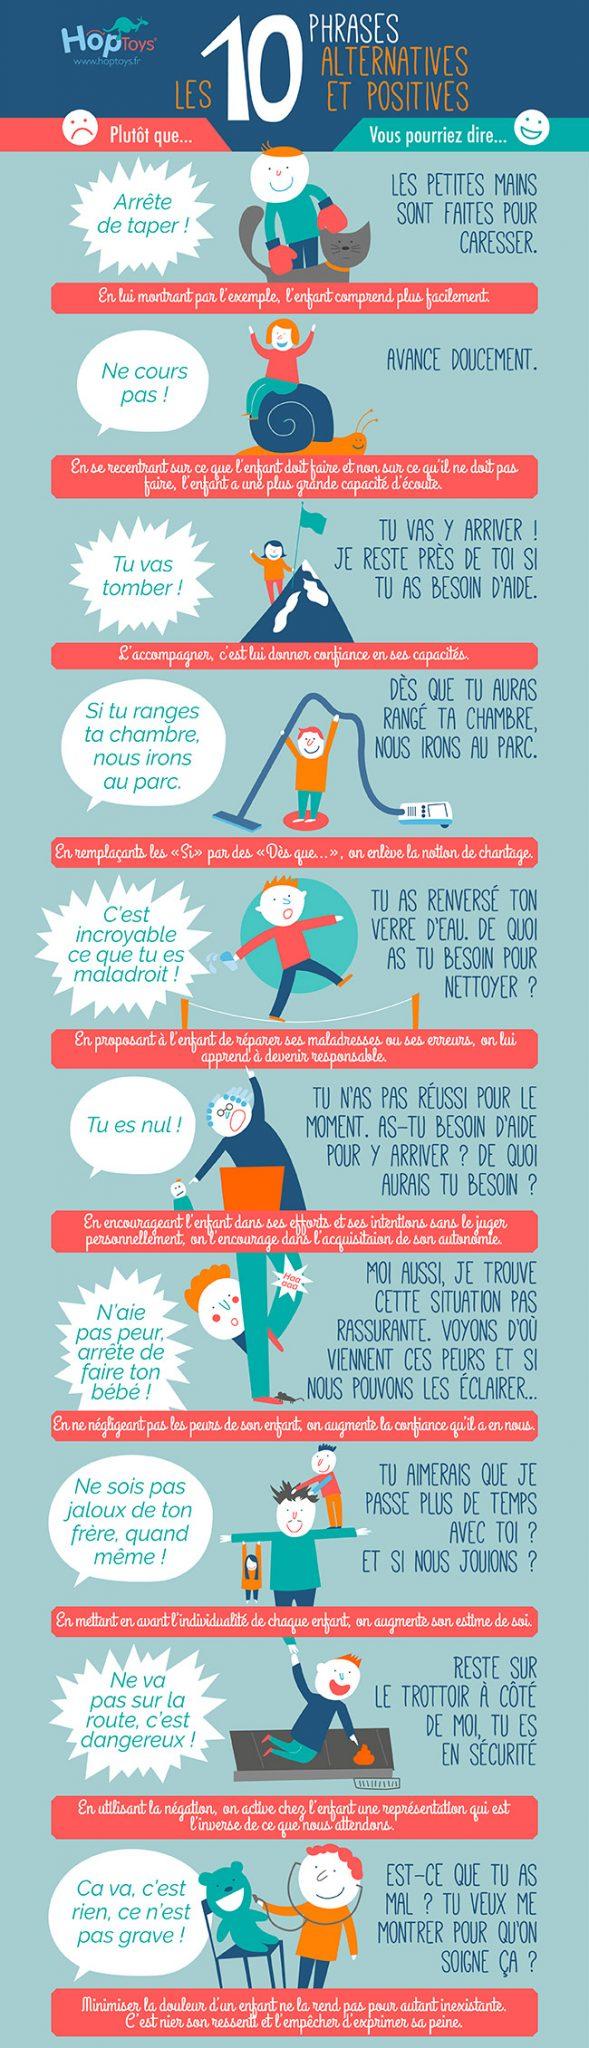 infographie 10 phrases alternatives positives